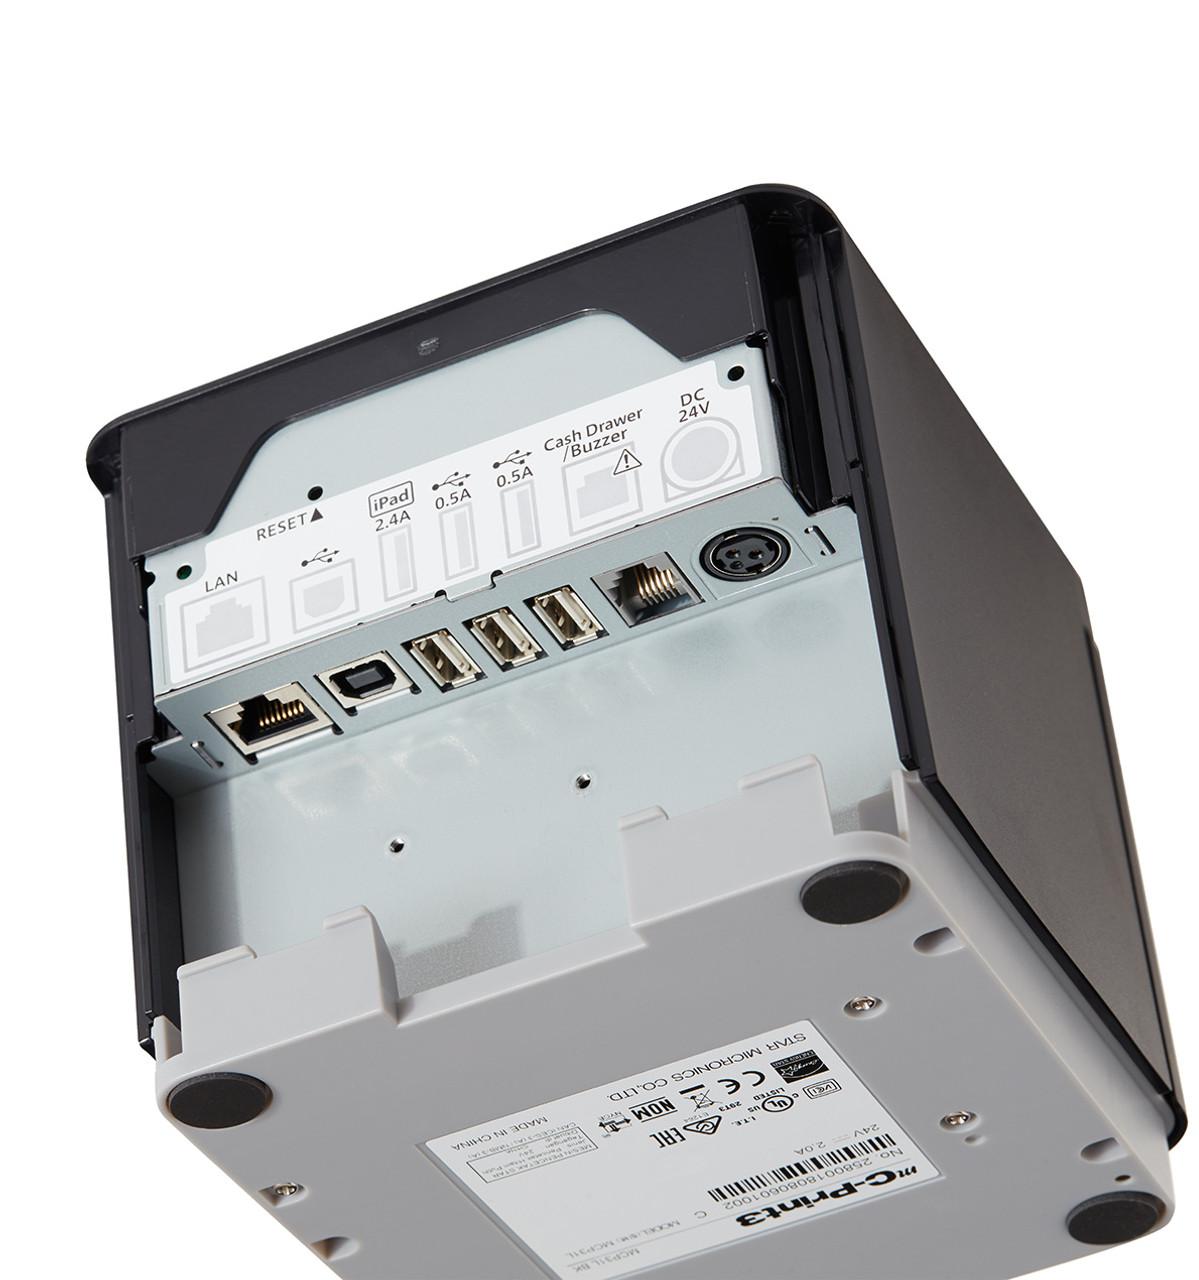 Star mC-Print3 Printer I/O Ports